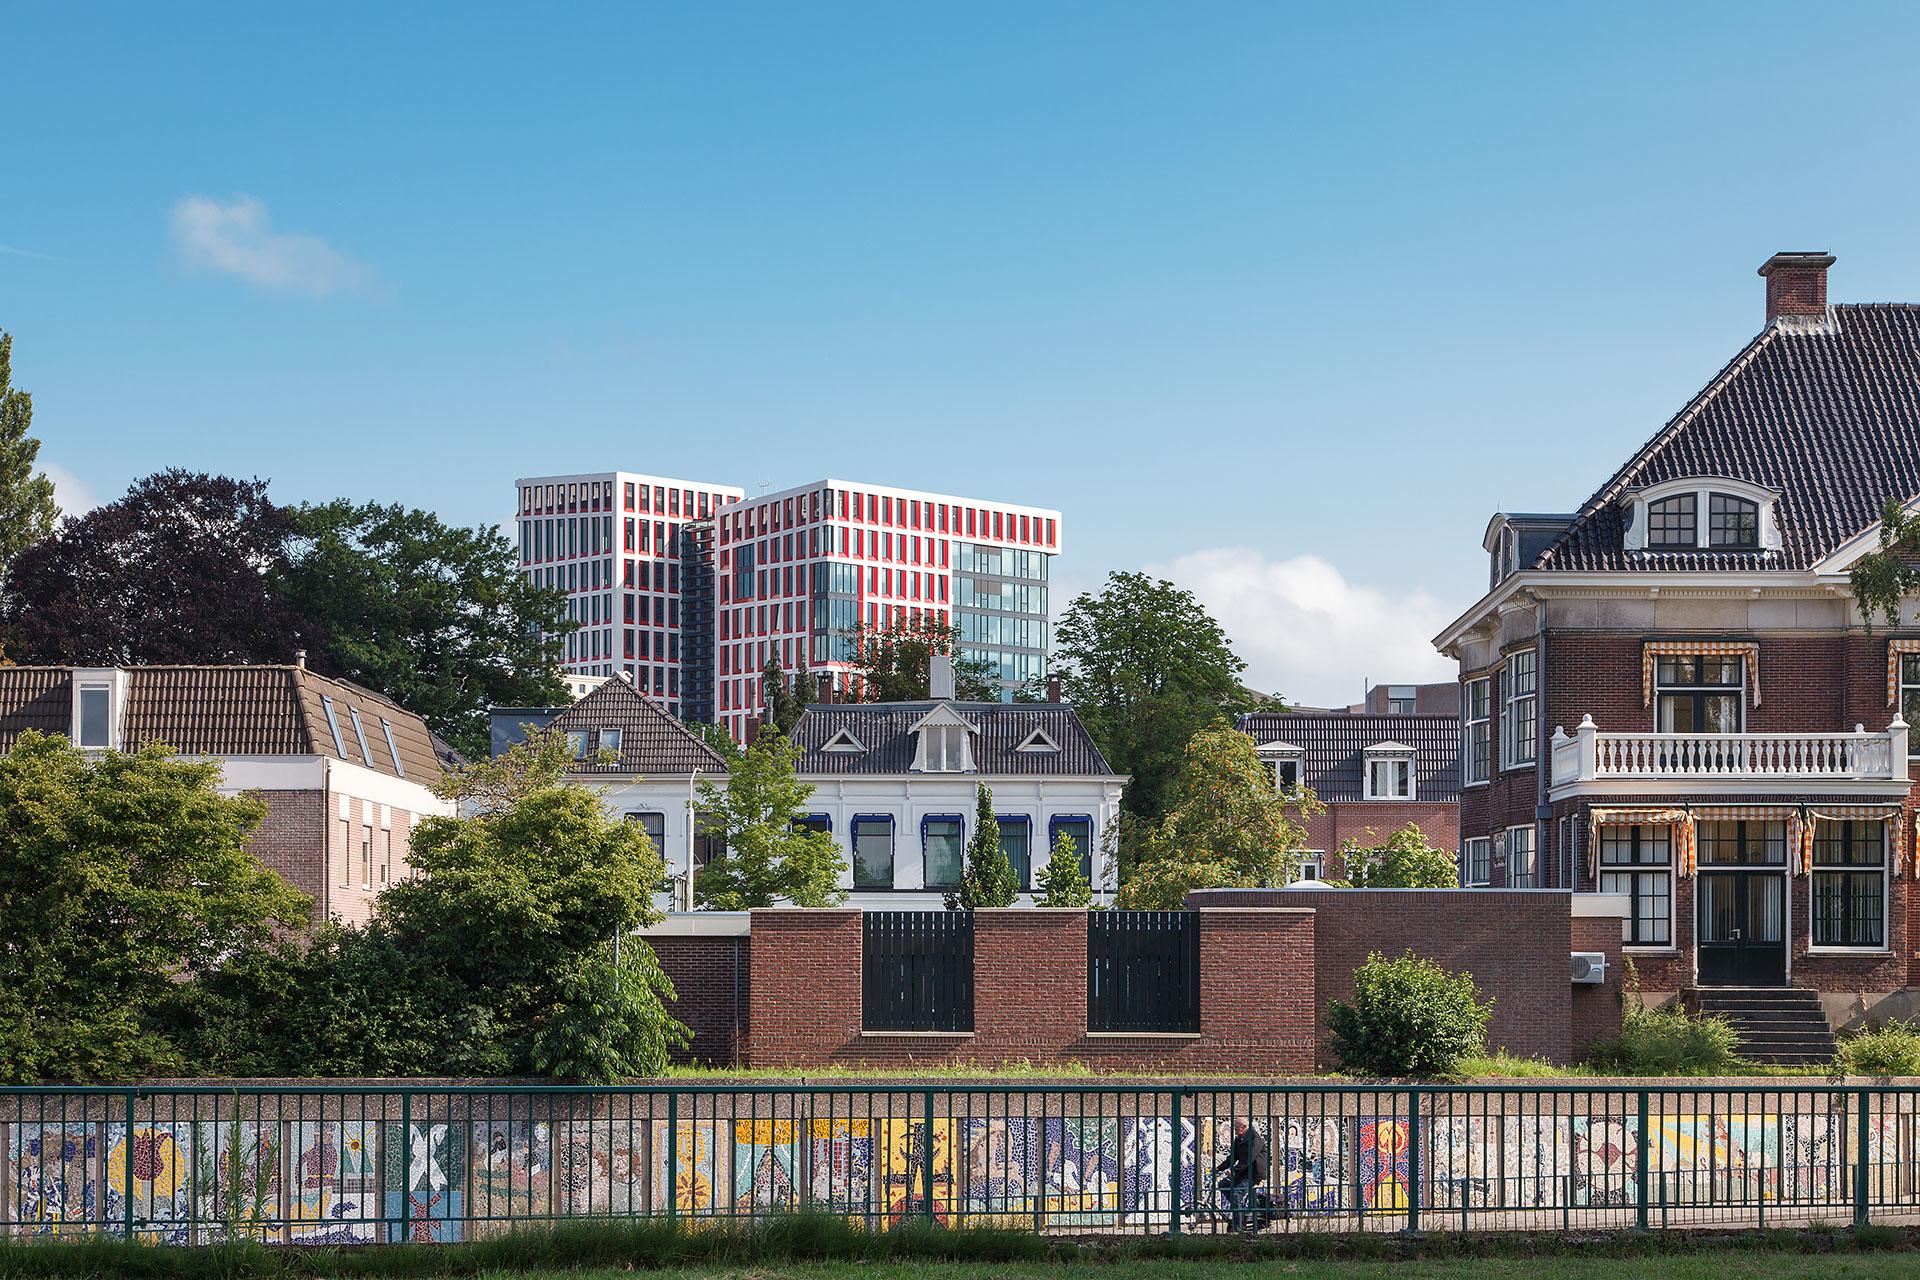 SP2015-Stadhuis-Almelo-architectuurfoto-01